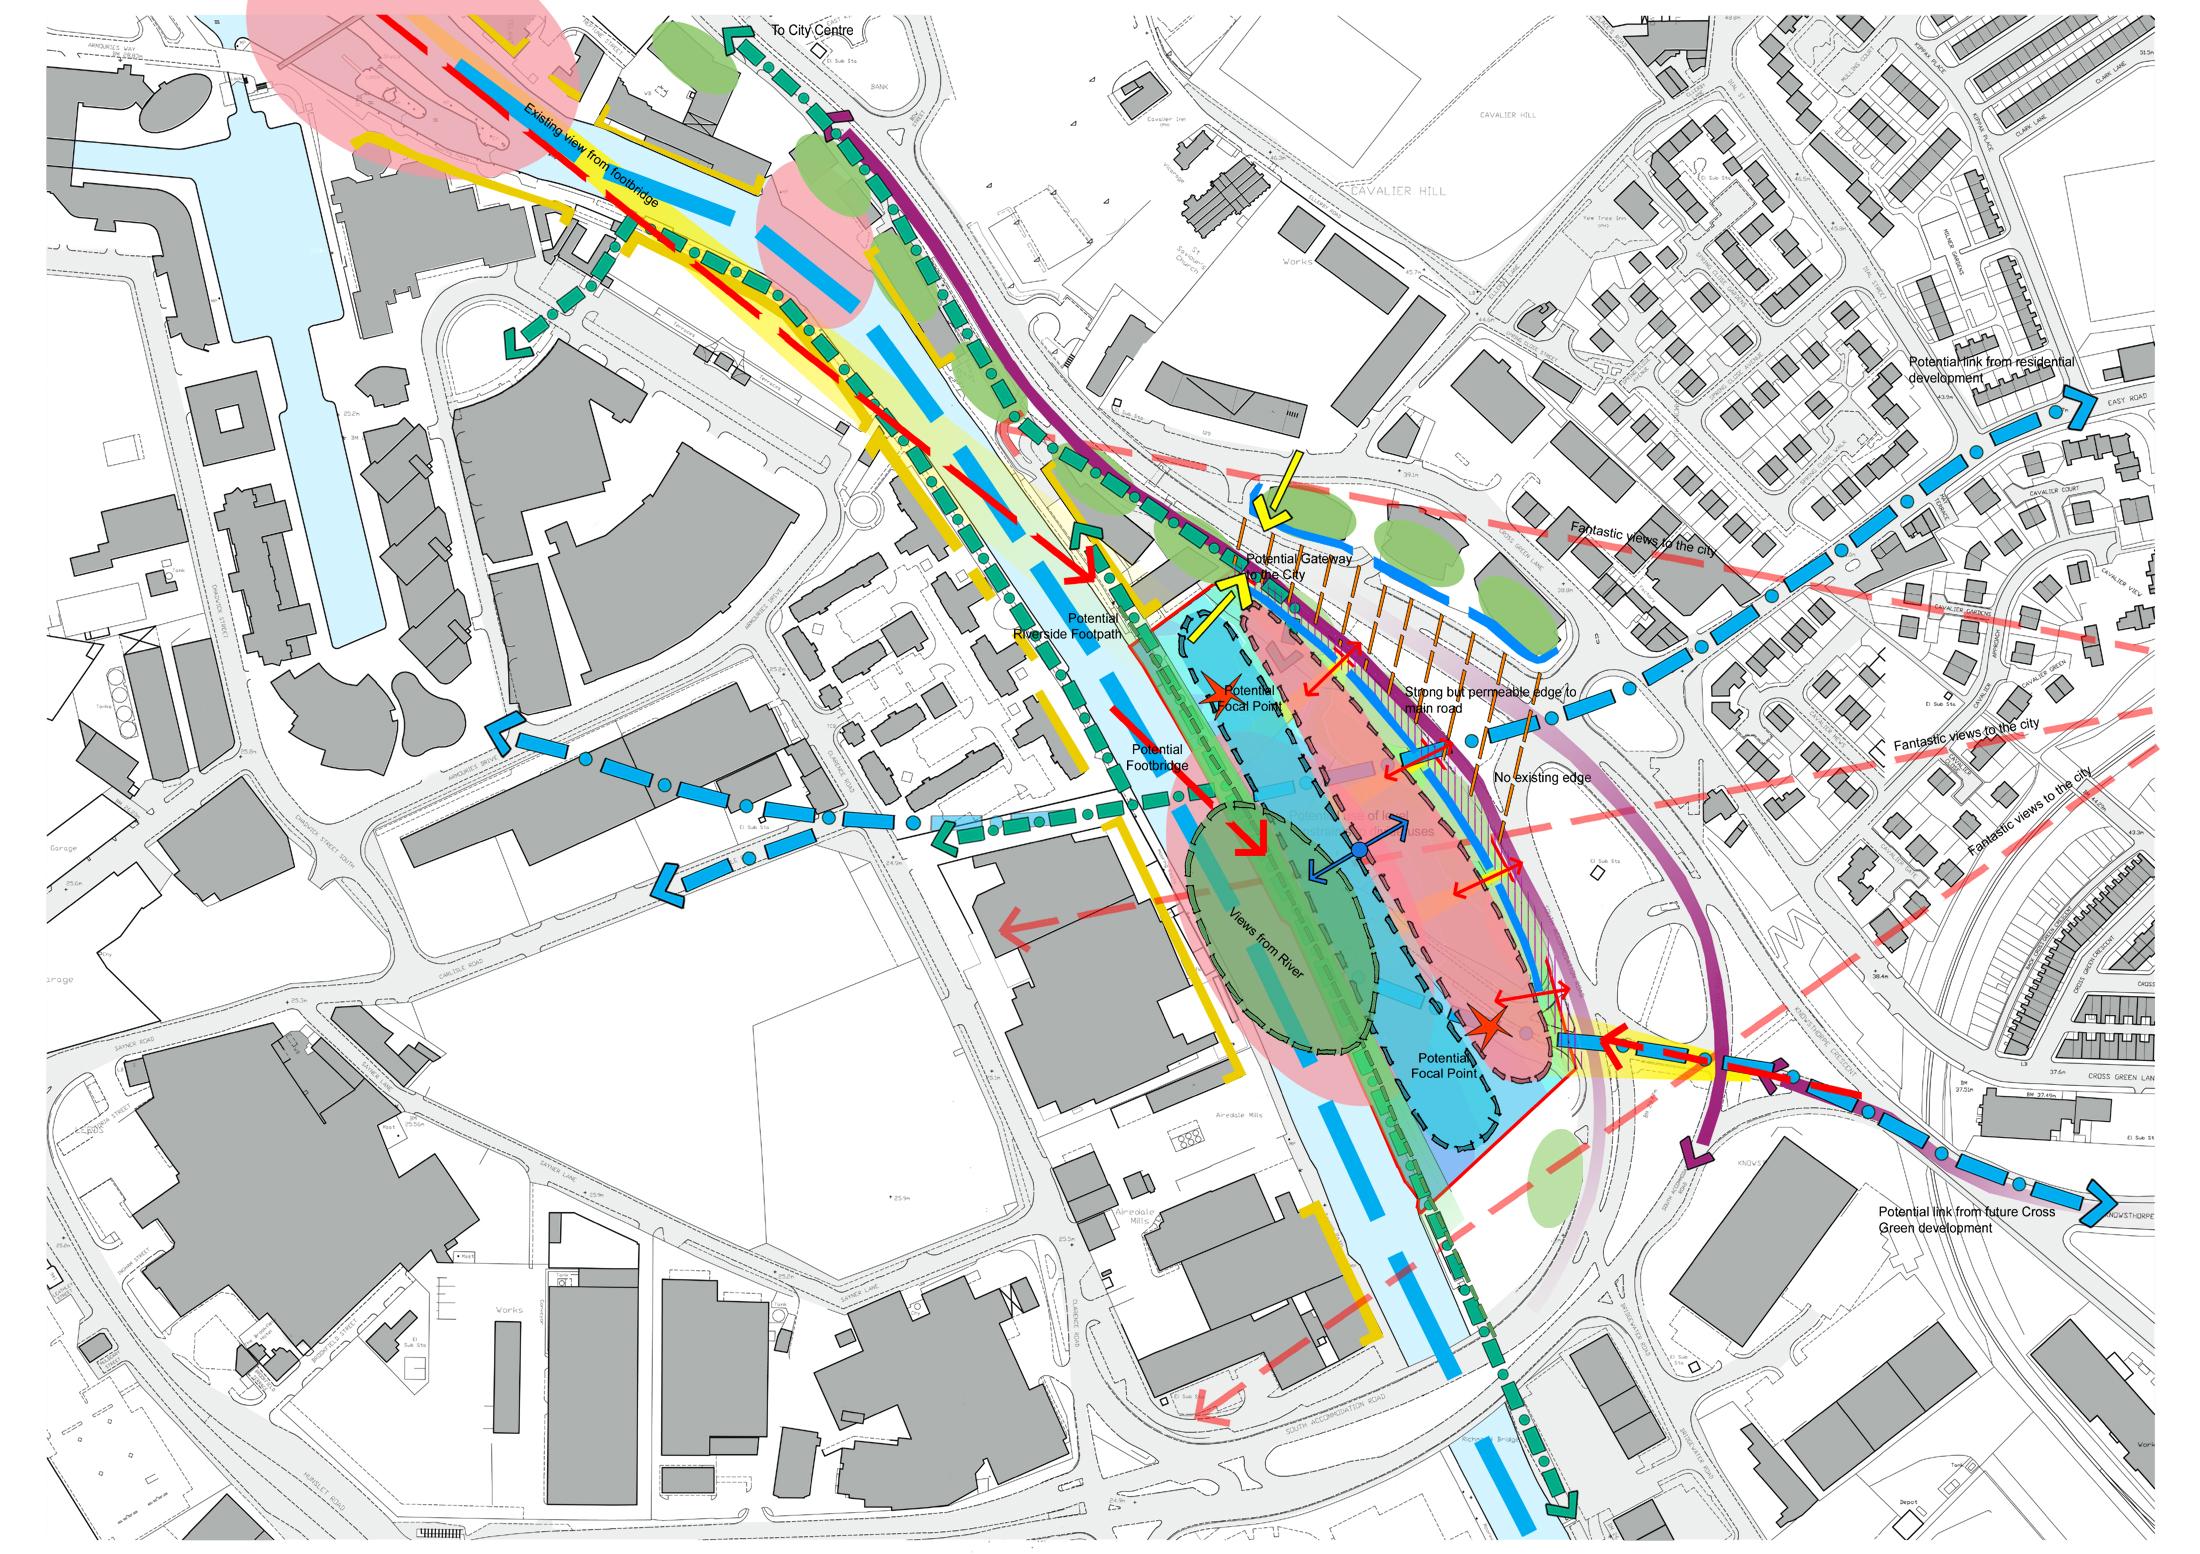 Urban Design Character Analysis : Urban design by stephanie houston at coroflot